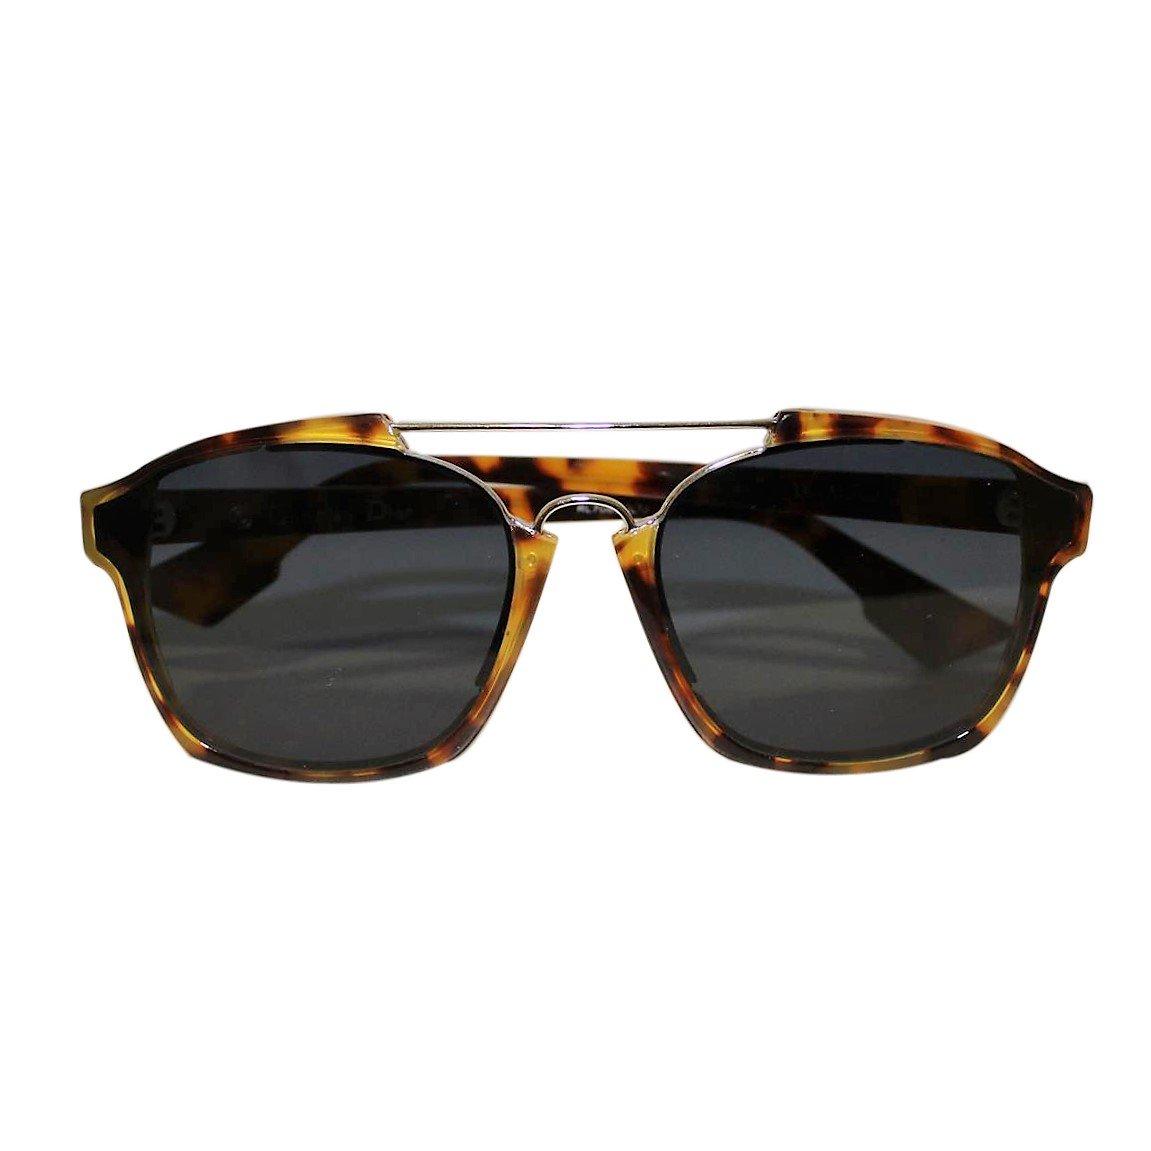 c85902558063 Buy Dior Abstract Havana sunglasses 54125 at best price